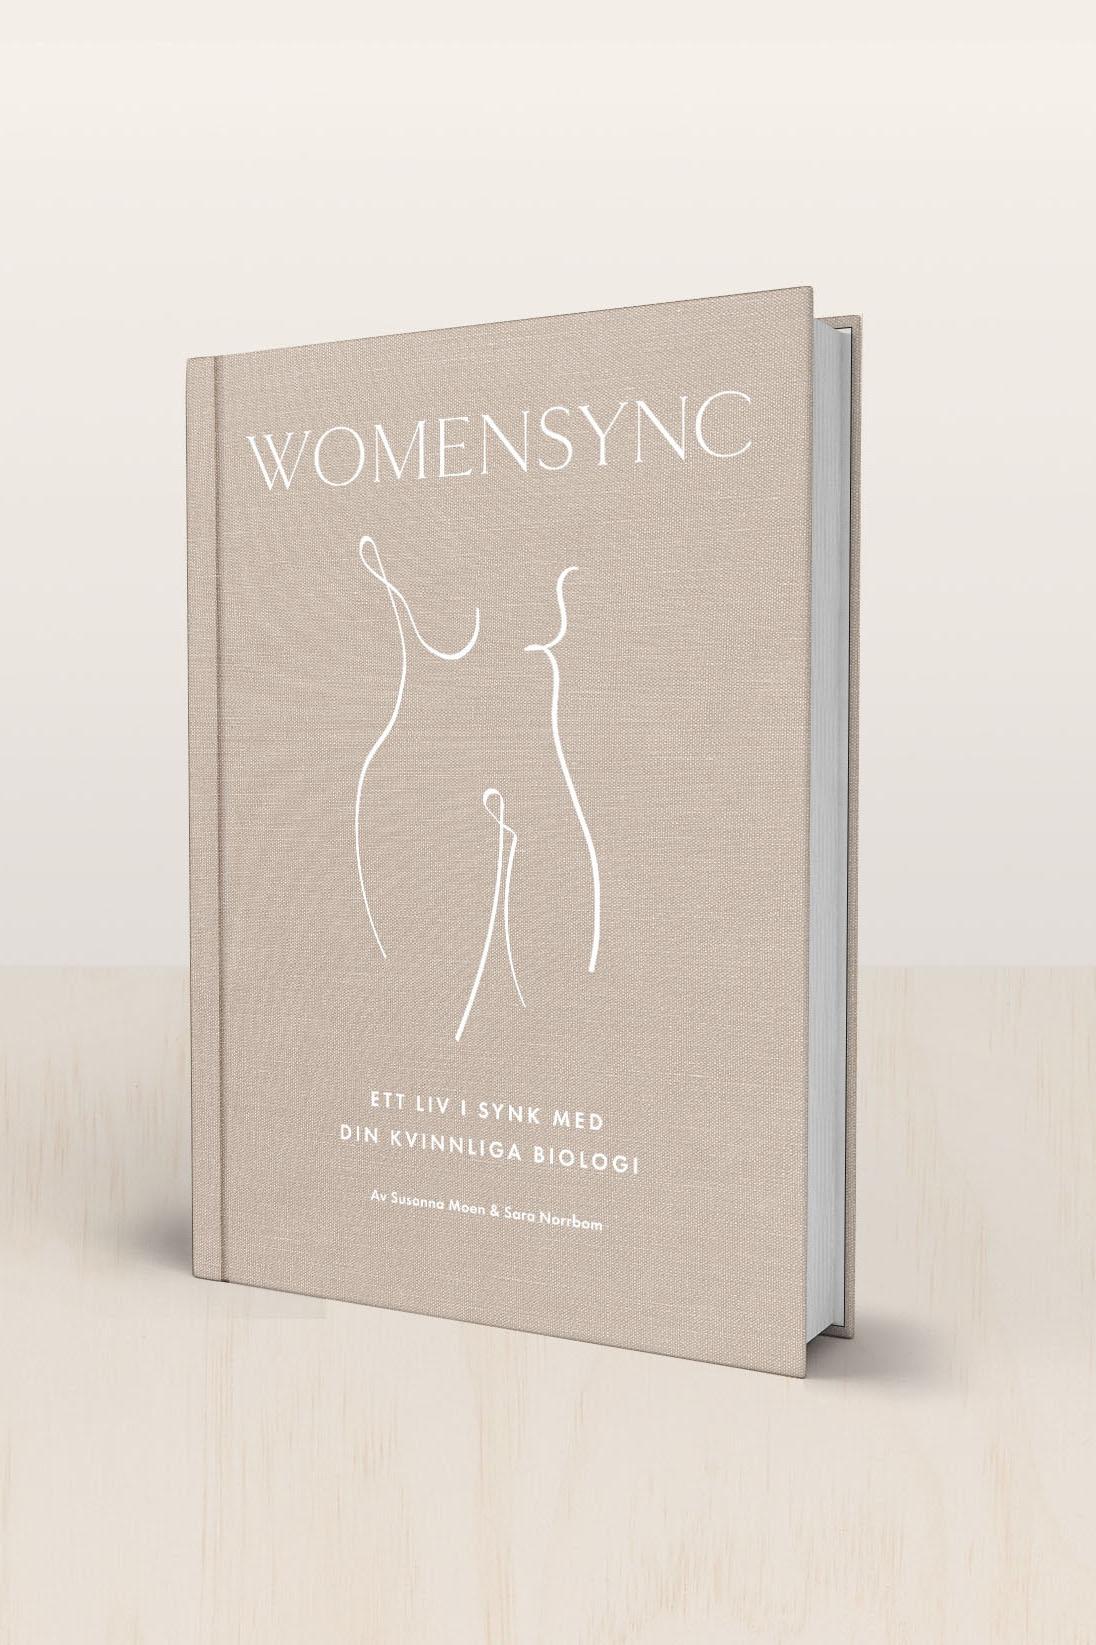 Womensync_mockup_bok_stående_4x6